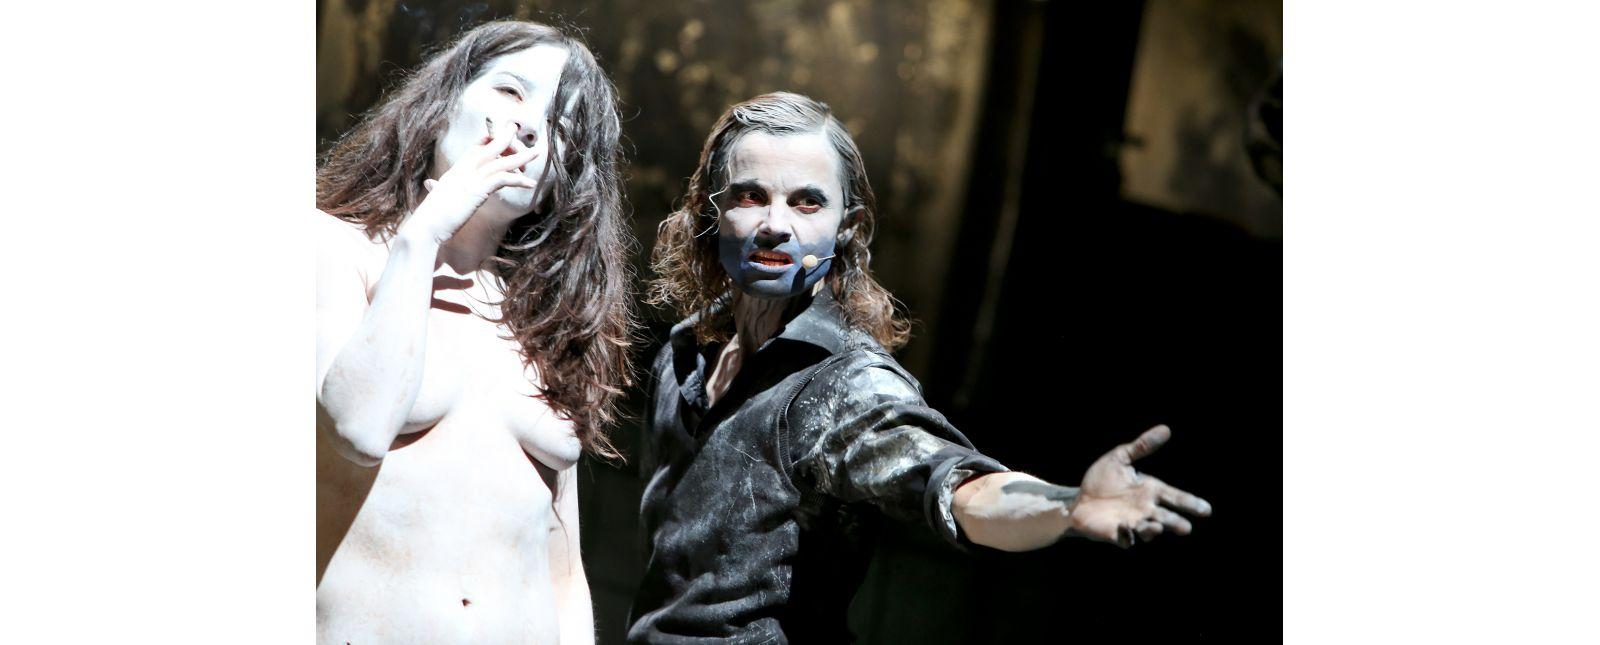 Lulu. Eine Mörderballade // Laura Angelina Palacios, Susanne Burkhard 2015 // Birgit Hupfeld